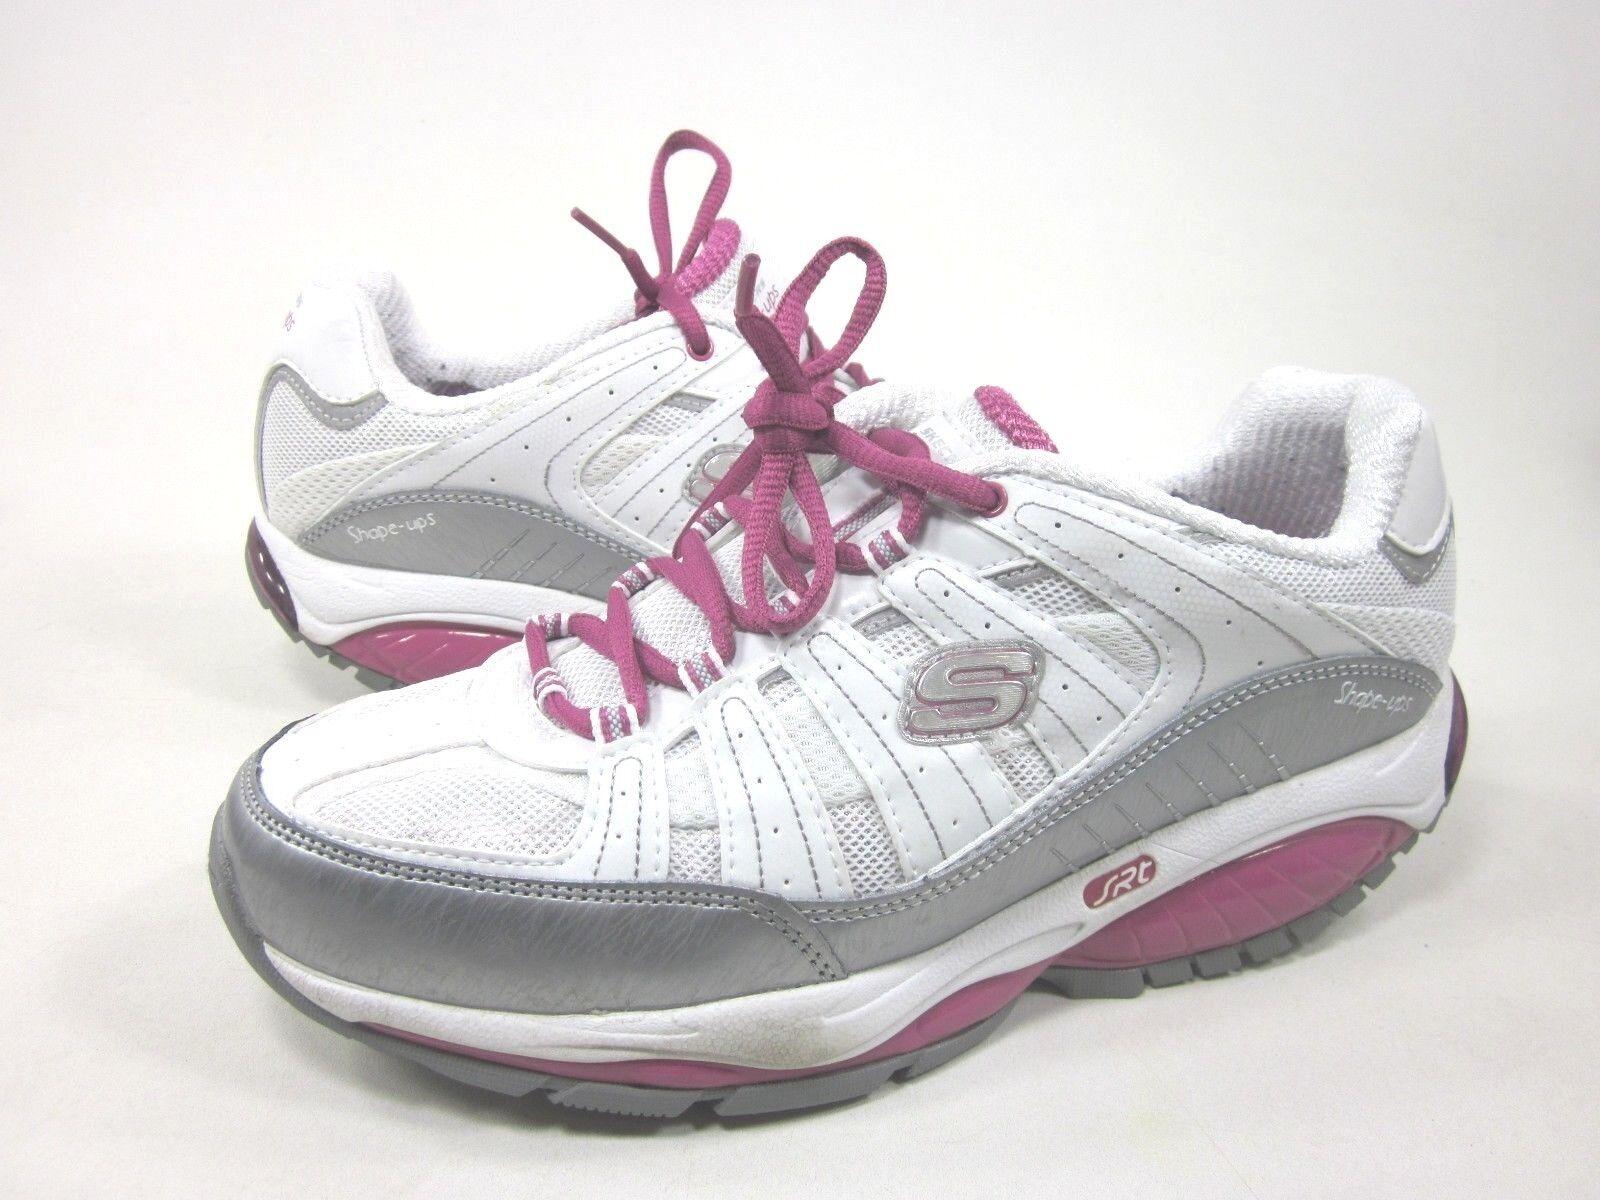 SKECHERS femmes SHAPE UPS KINETIX RESPONSE WALKING Chaussures ,blanc/rose,US SIZE 8.5